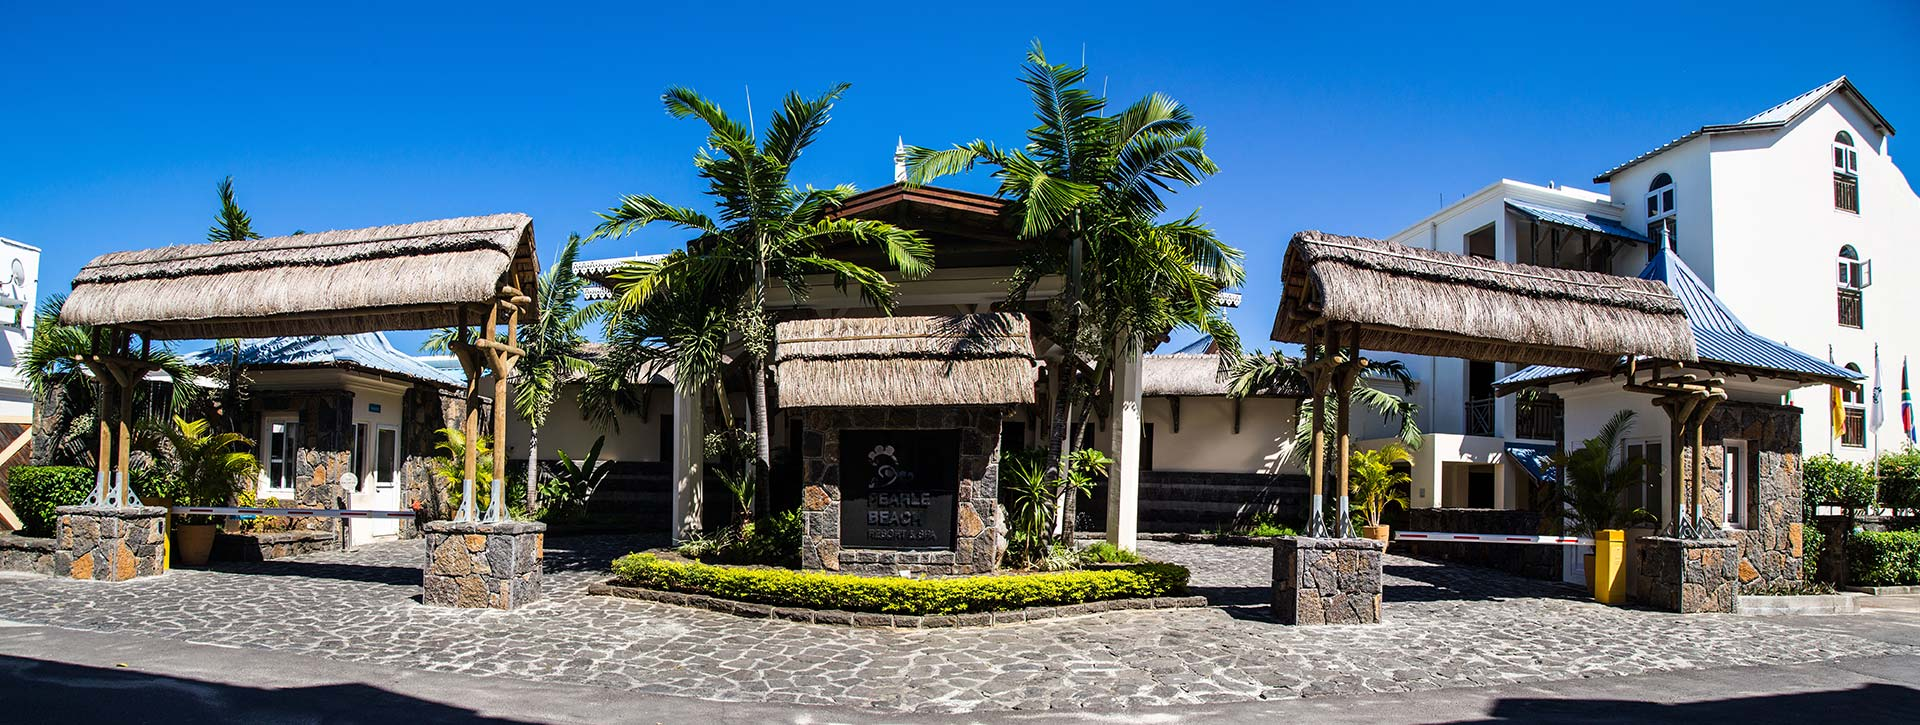 Pearle Beach Resort & Spa Entrance Mauritius